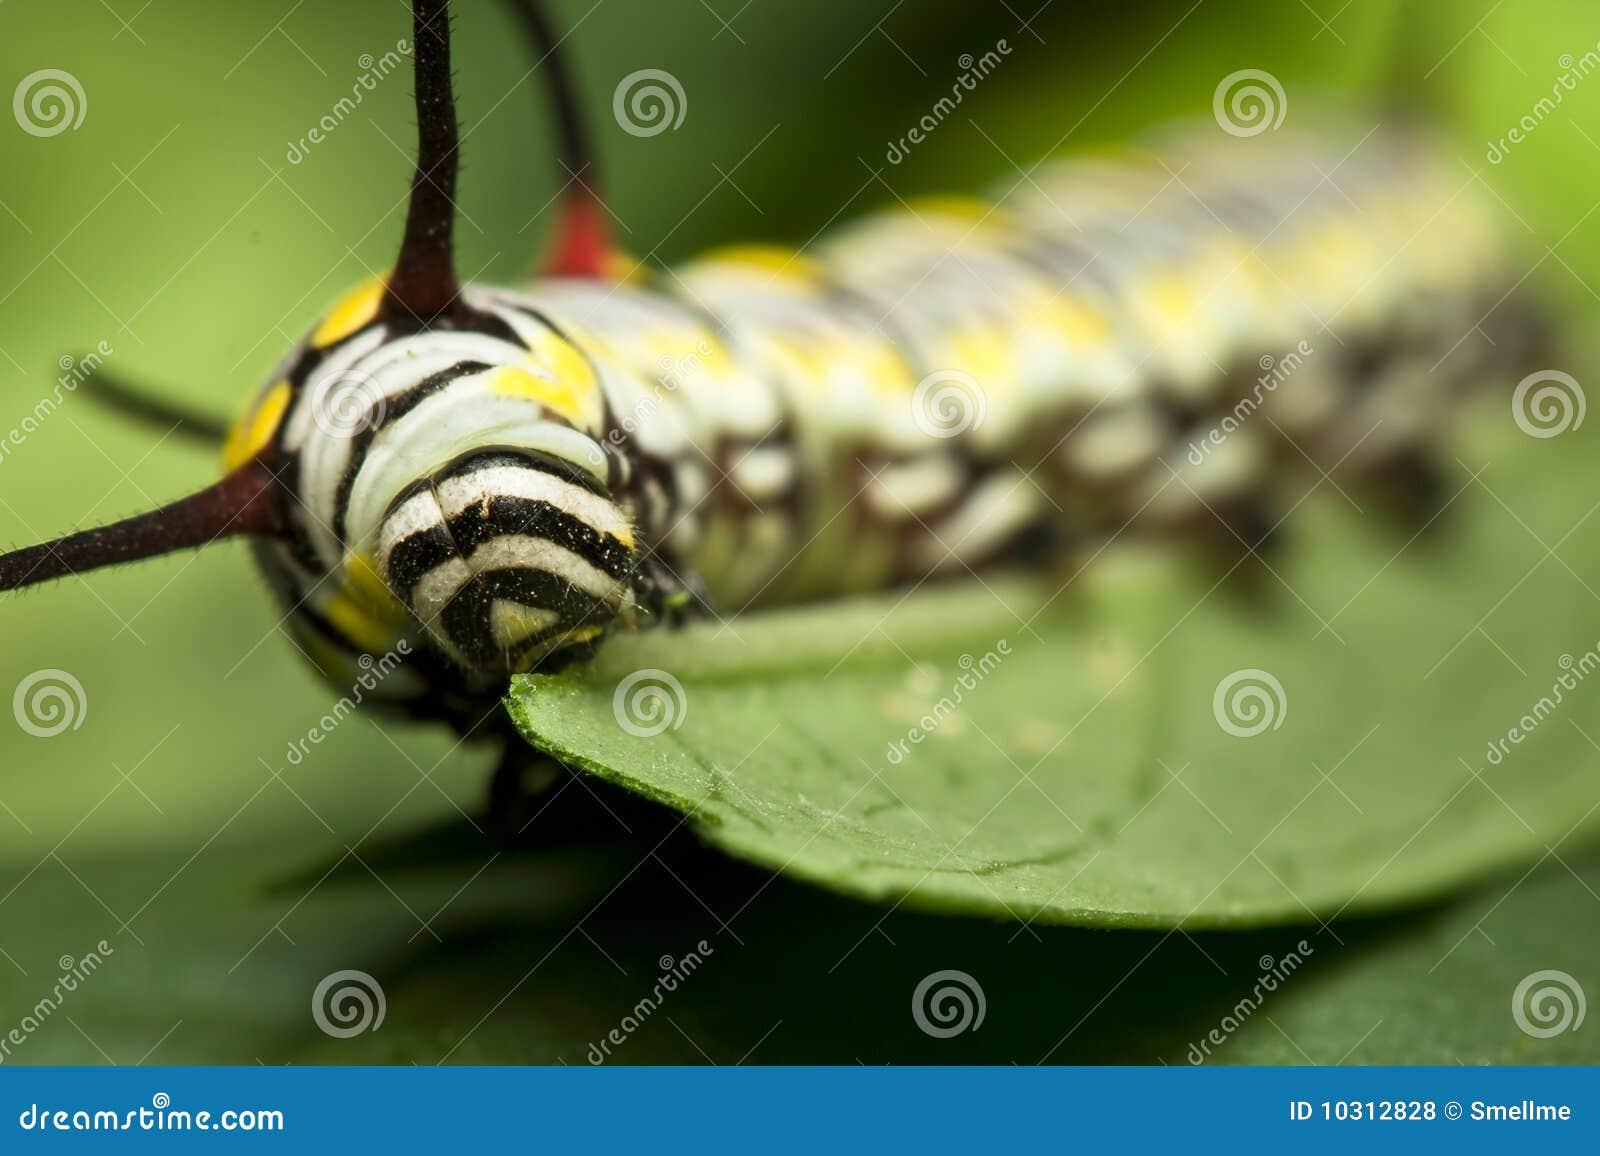 Black Swallowtail Caterpillar eating